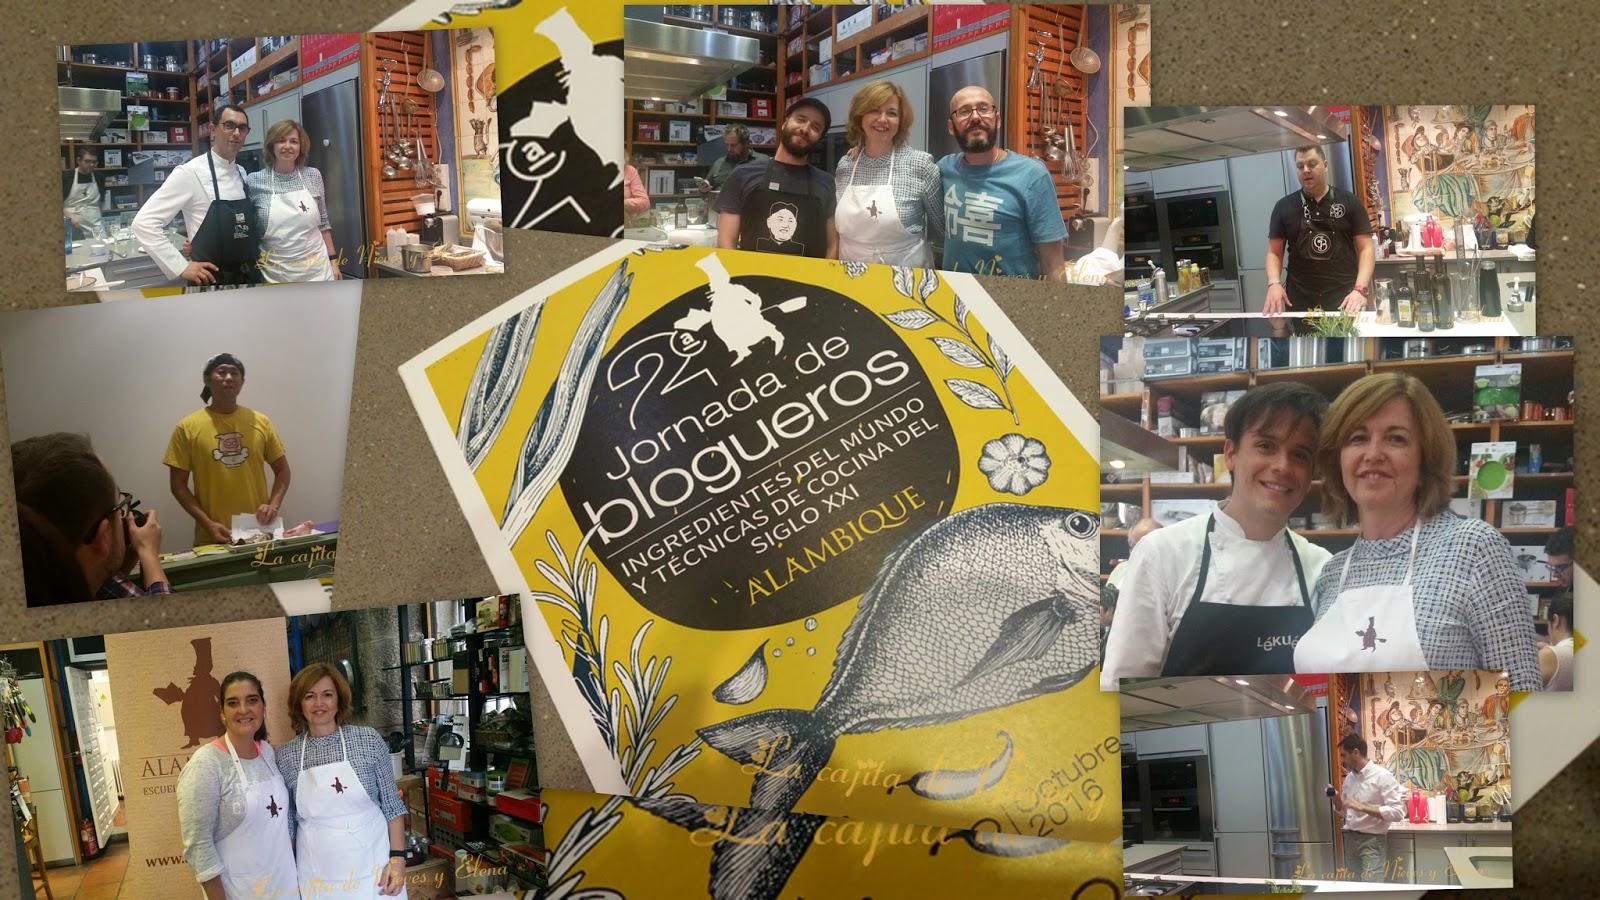 2 jornada de blogueros alambique for Alambique madrid